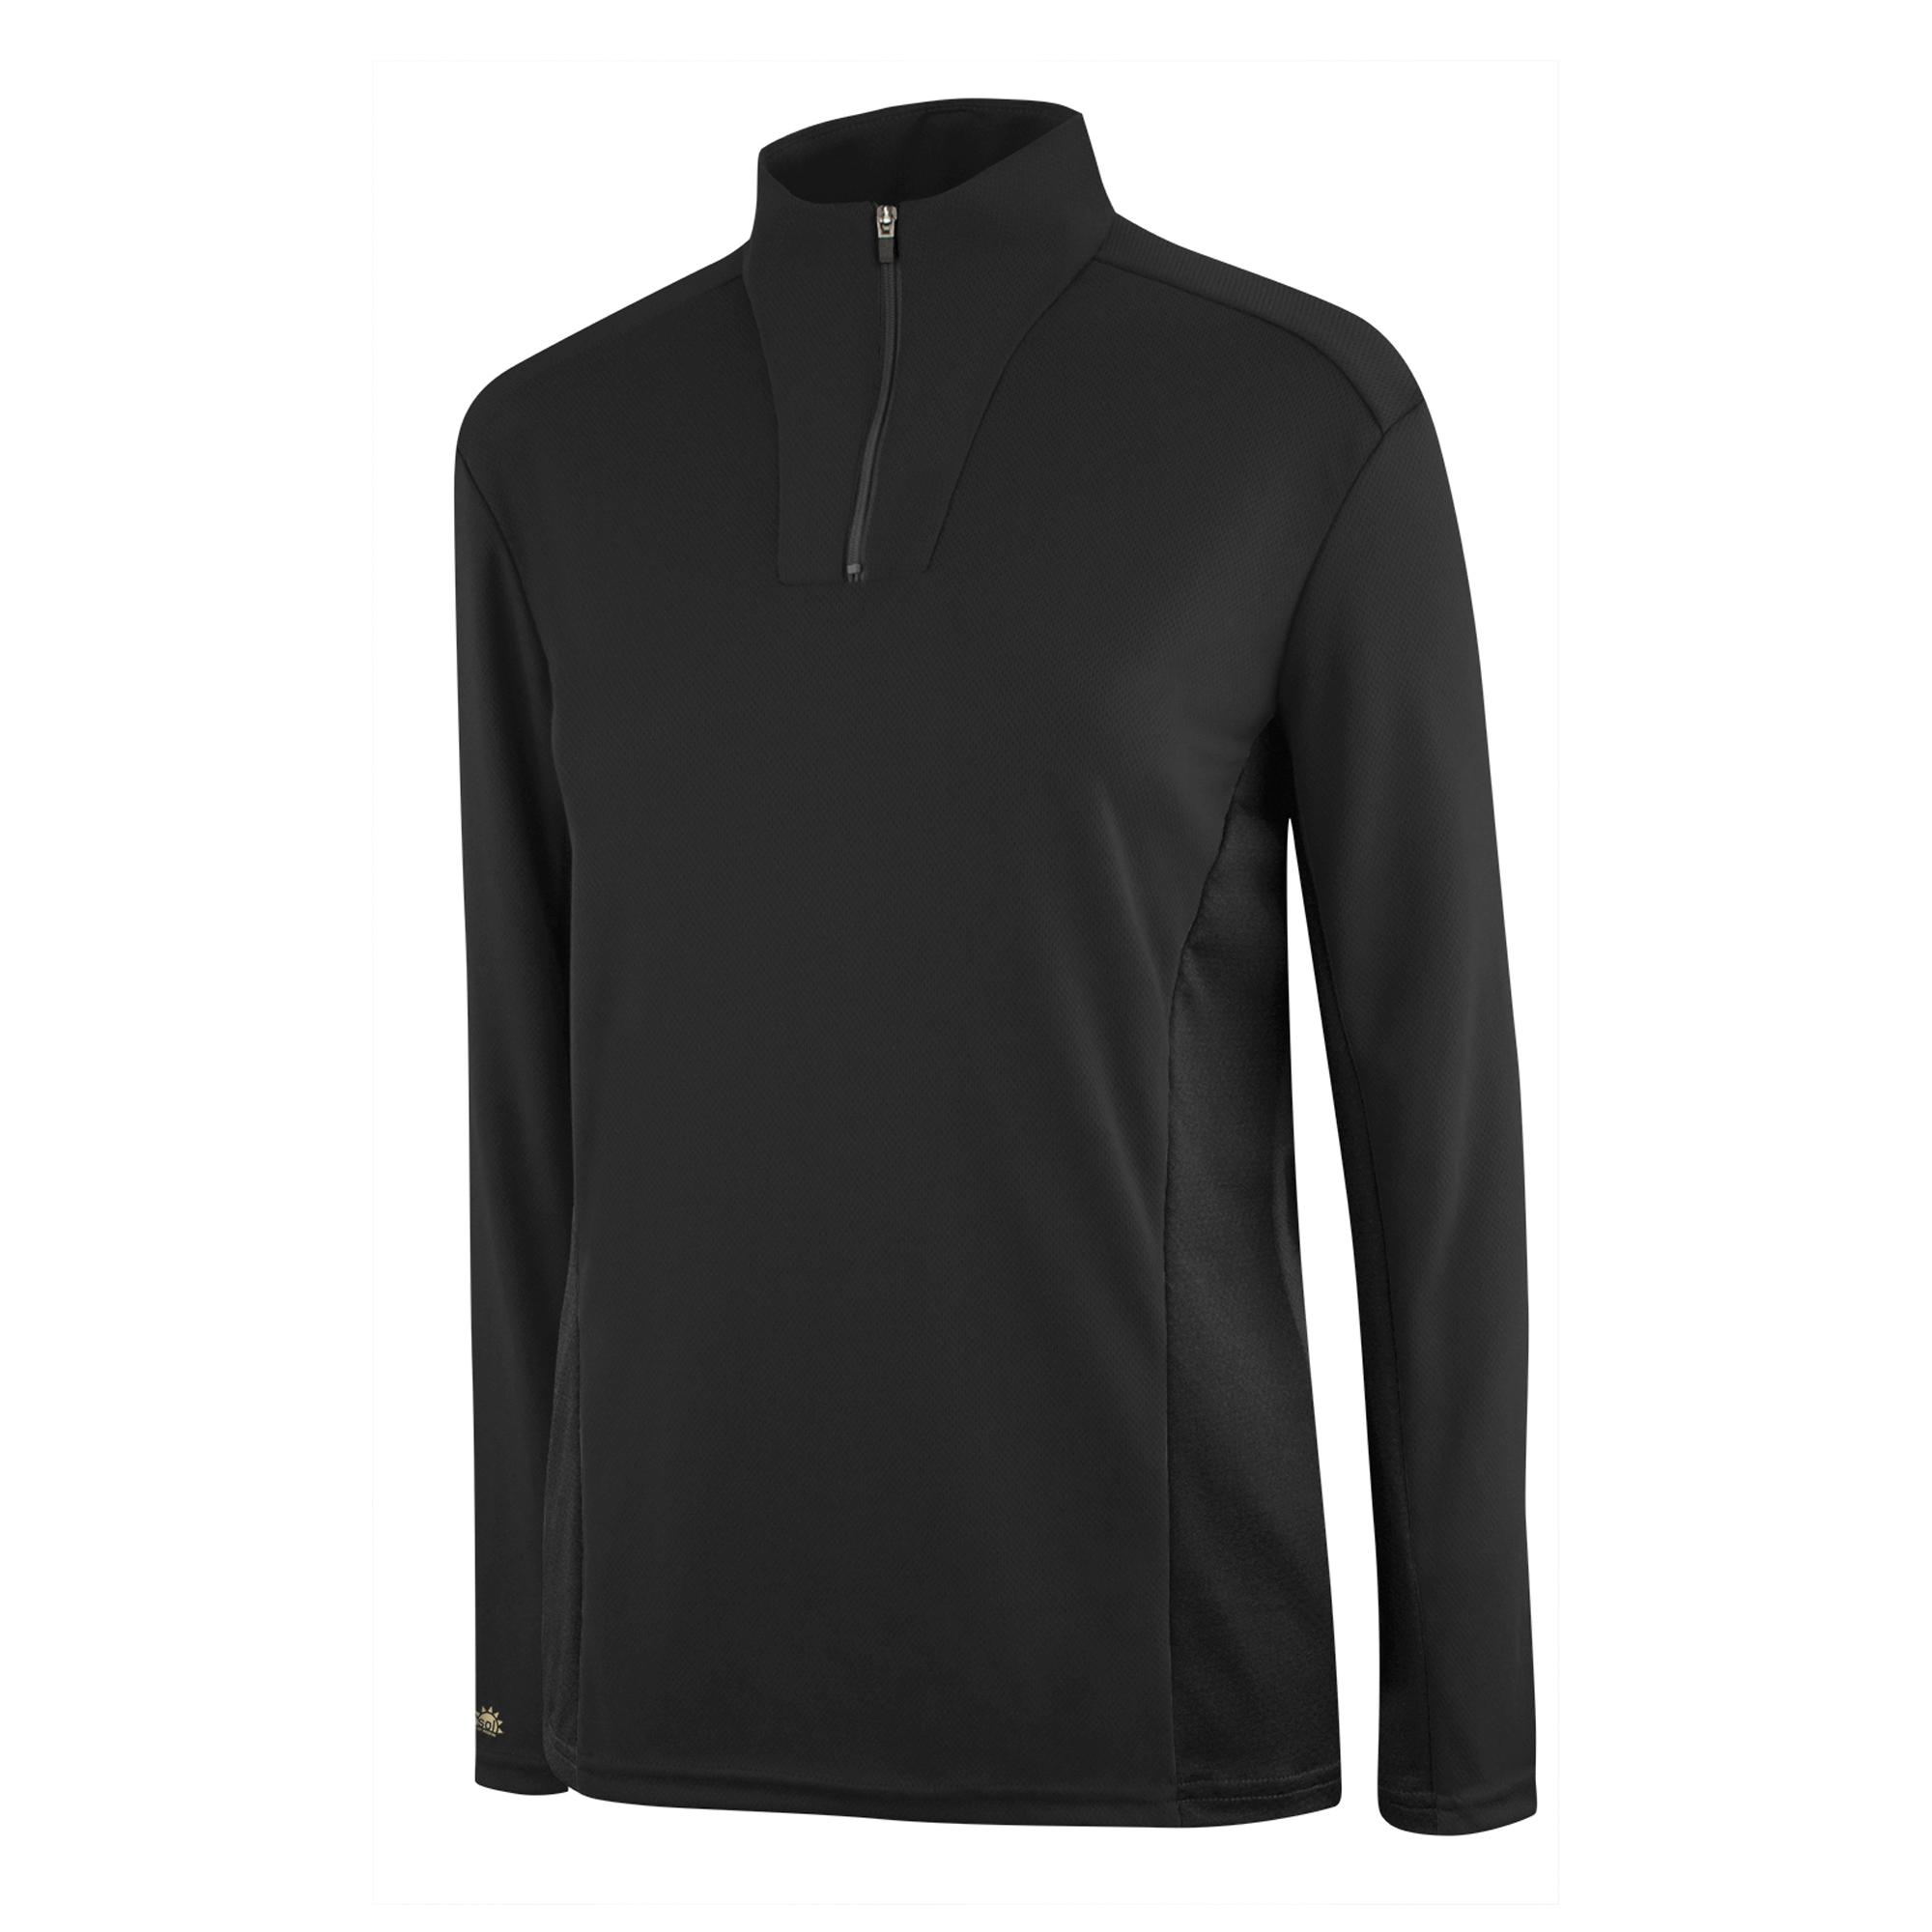 Irideon Radiance Parasol Long Sleeve Jersey